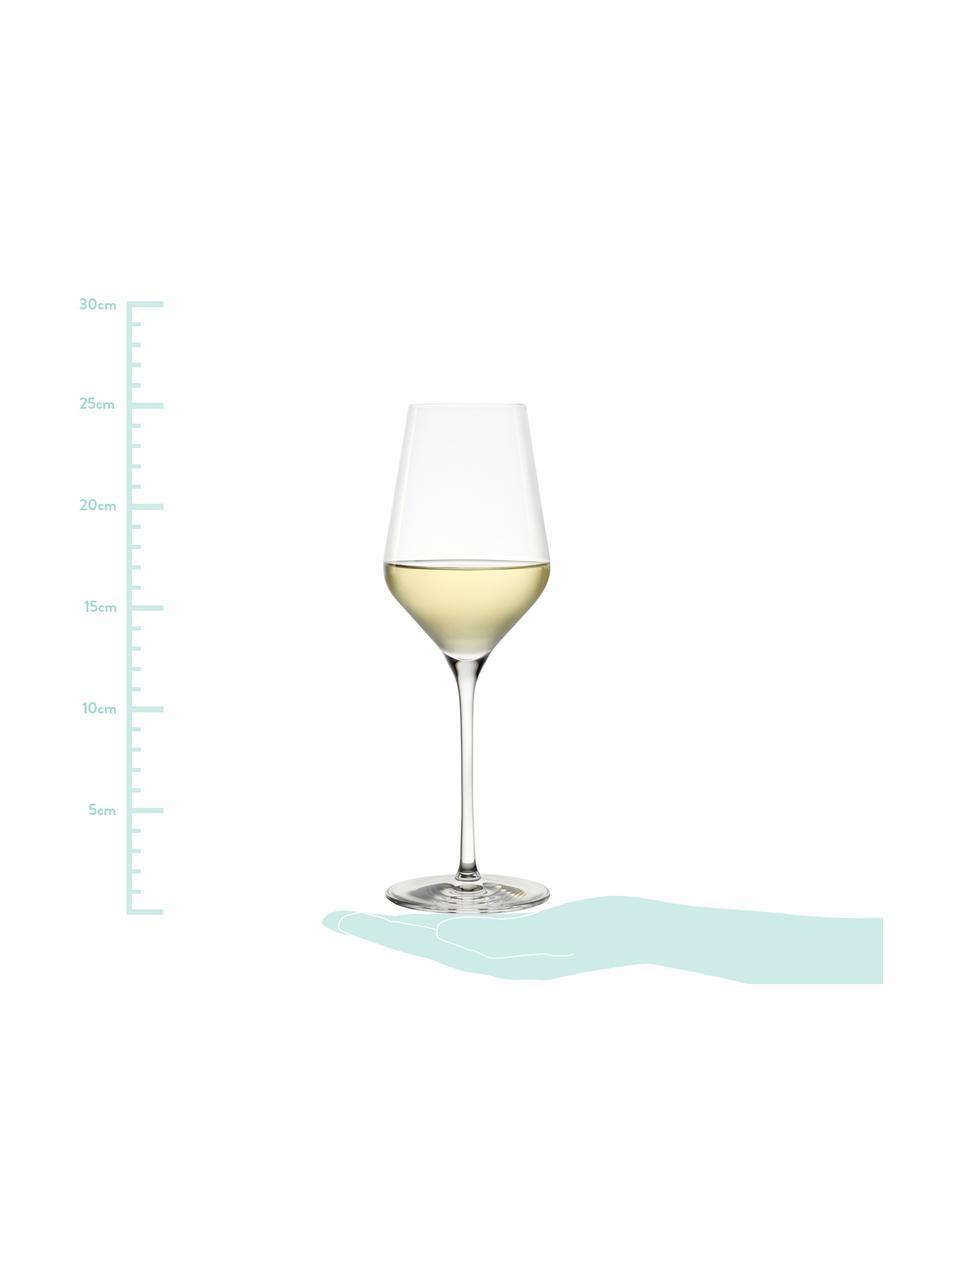 Kristall-Weißweingläser Quatrophil, 6 Stück, Kristallglas, Transparent, Ø 8 x H 25 cm